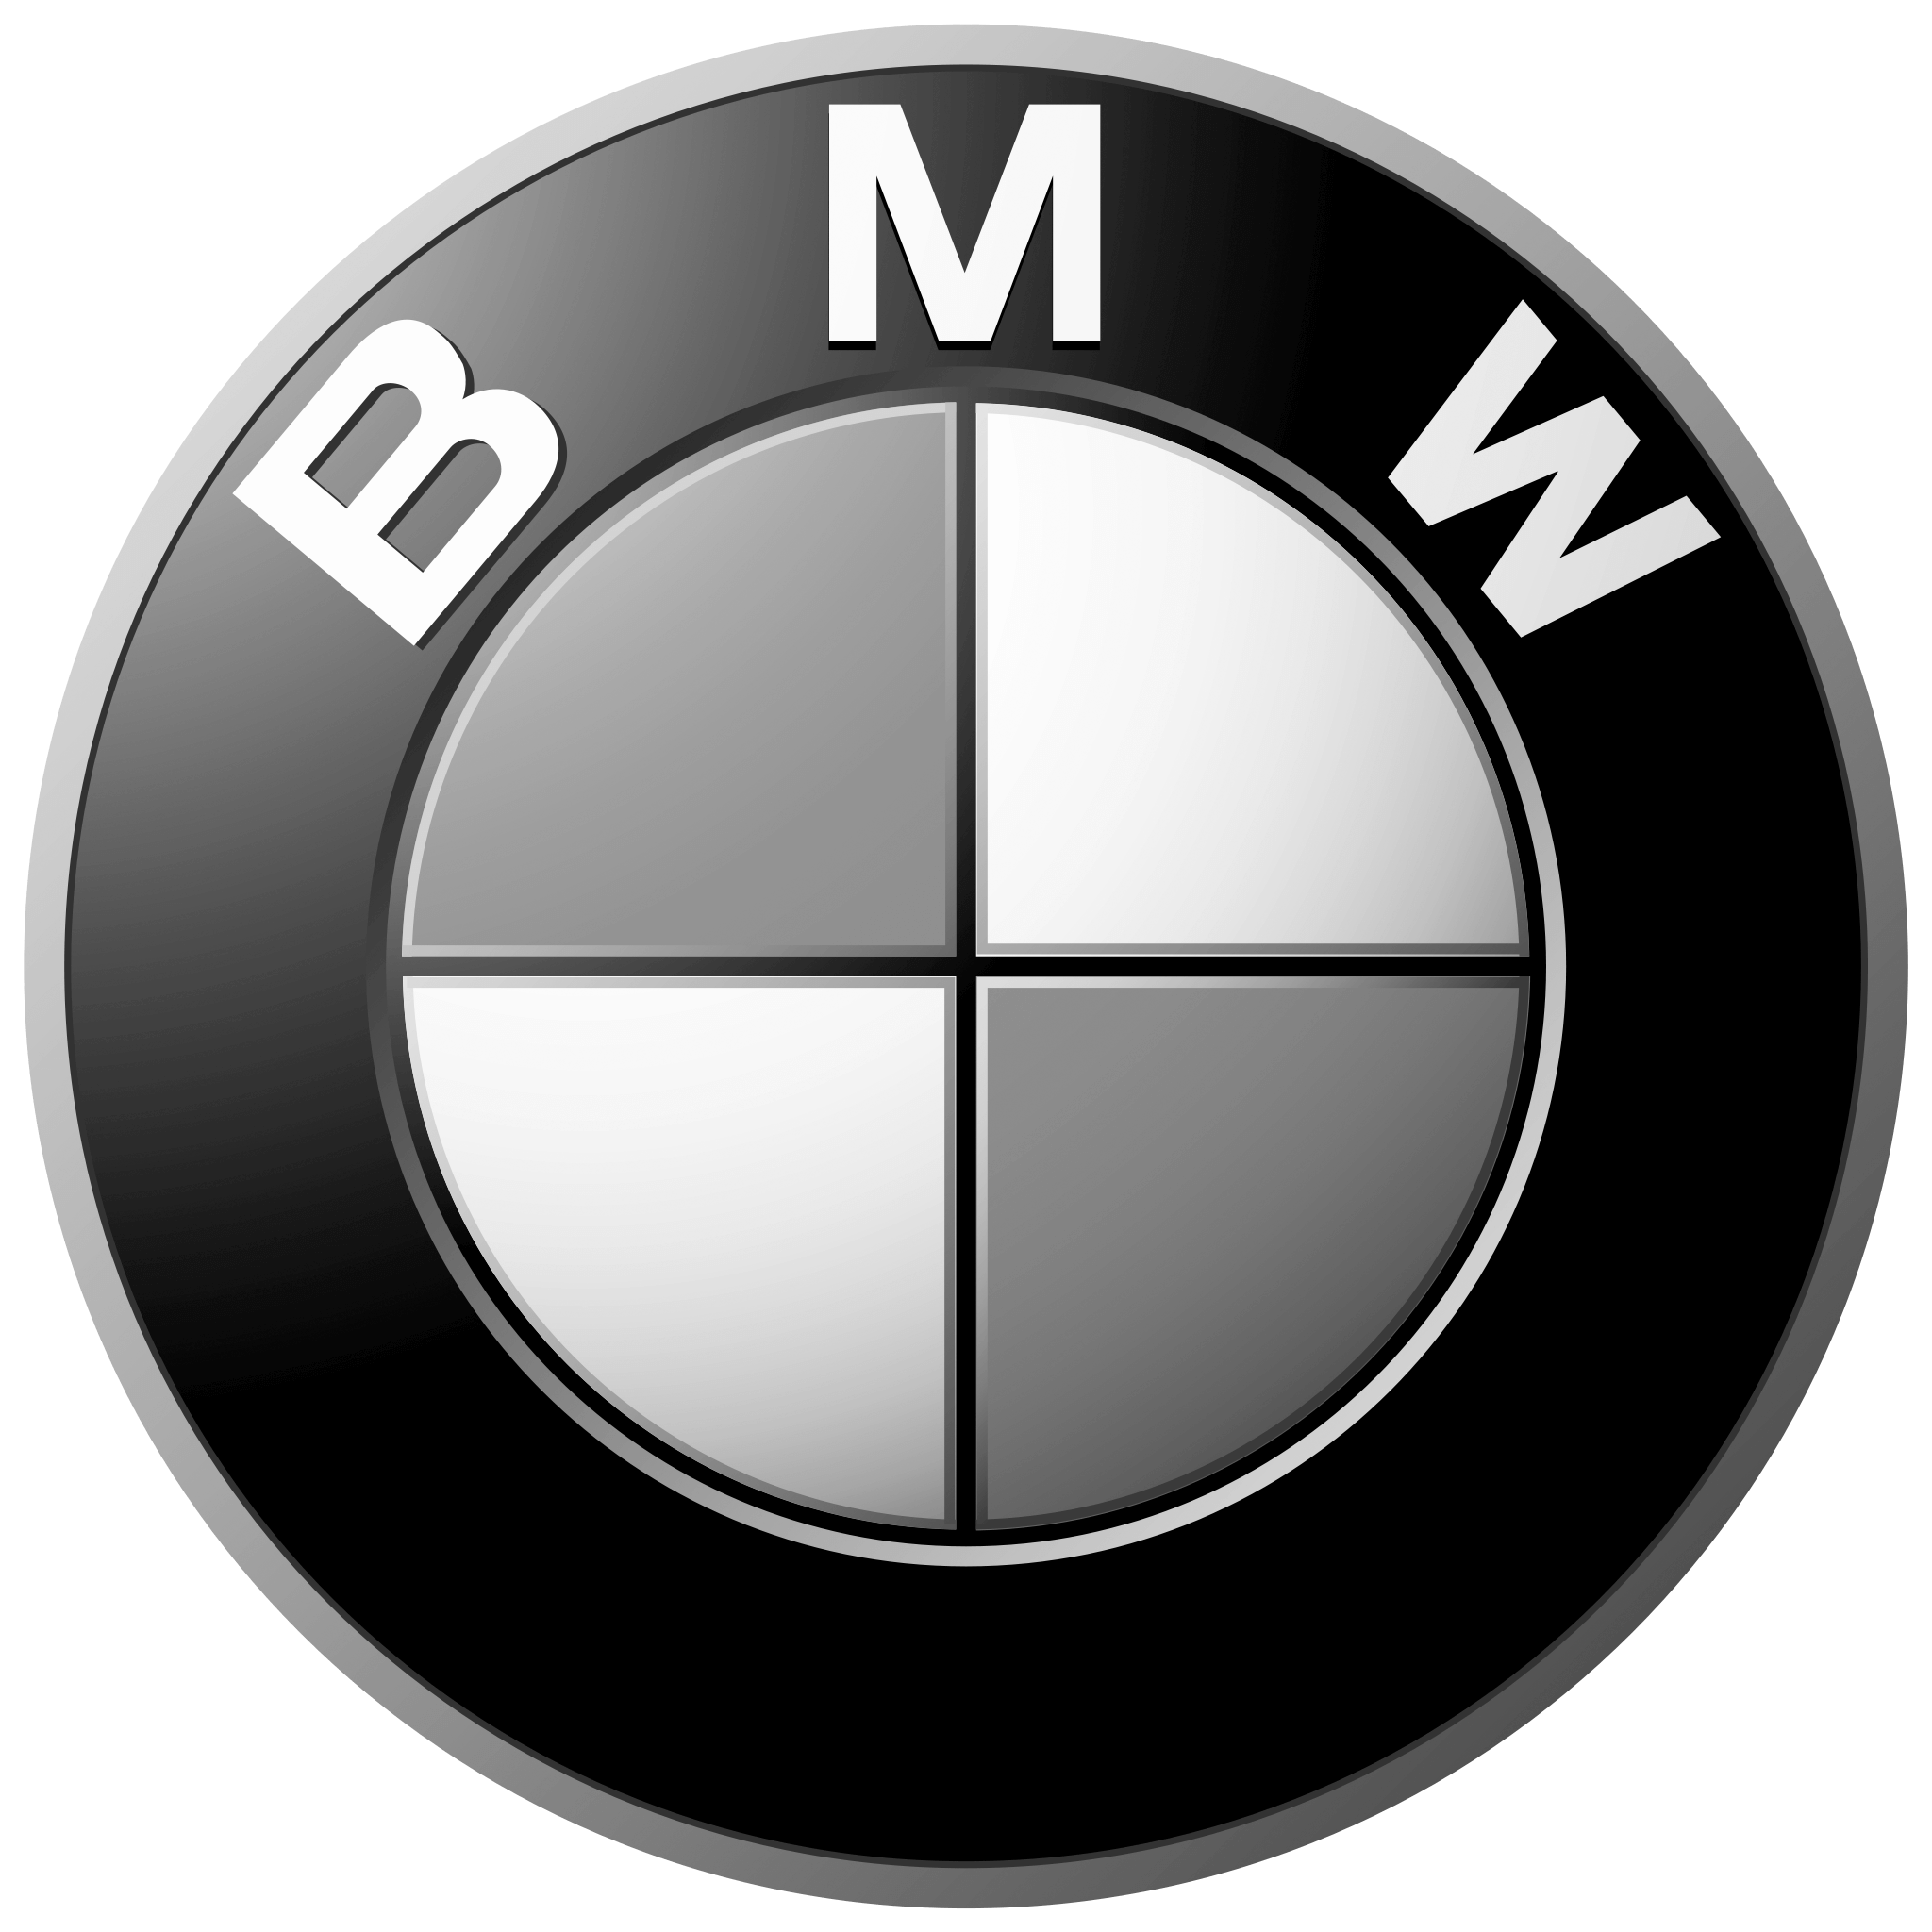 BMW - location matrimoni milano, location per matrimoni, matrimonio civile milano, eventi aziendali milano, location matrimonio, villa per matrimoni, villa per matrimoni lombardia